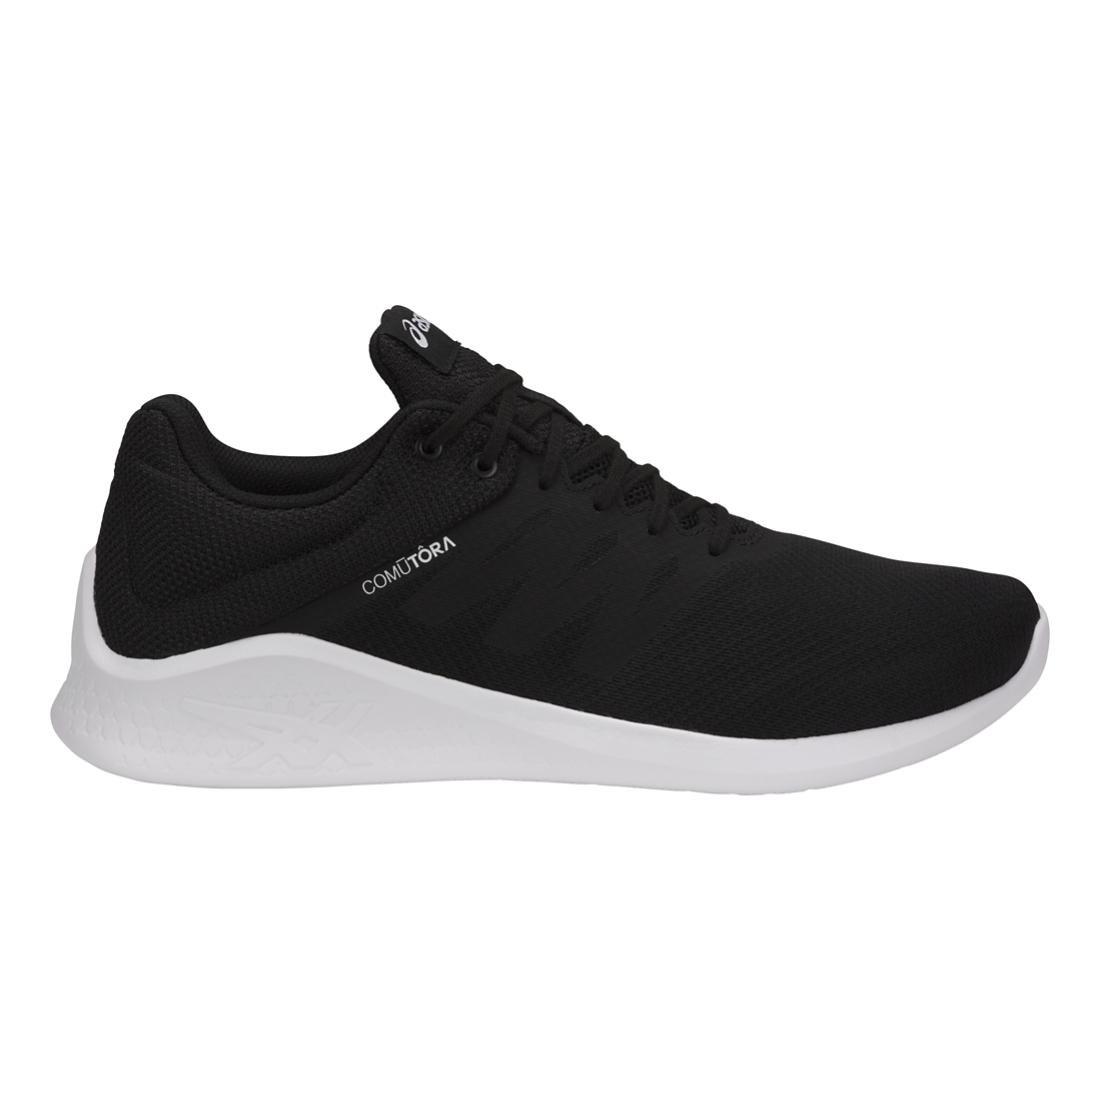 ASICS Women's COMUTORA Running Shoe B071LH6Z61 8 B(M) US Black/Black/White